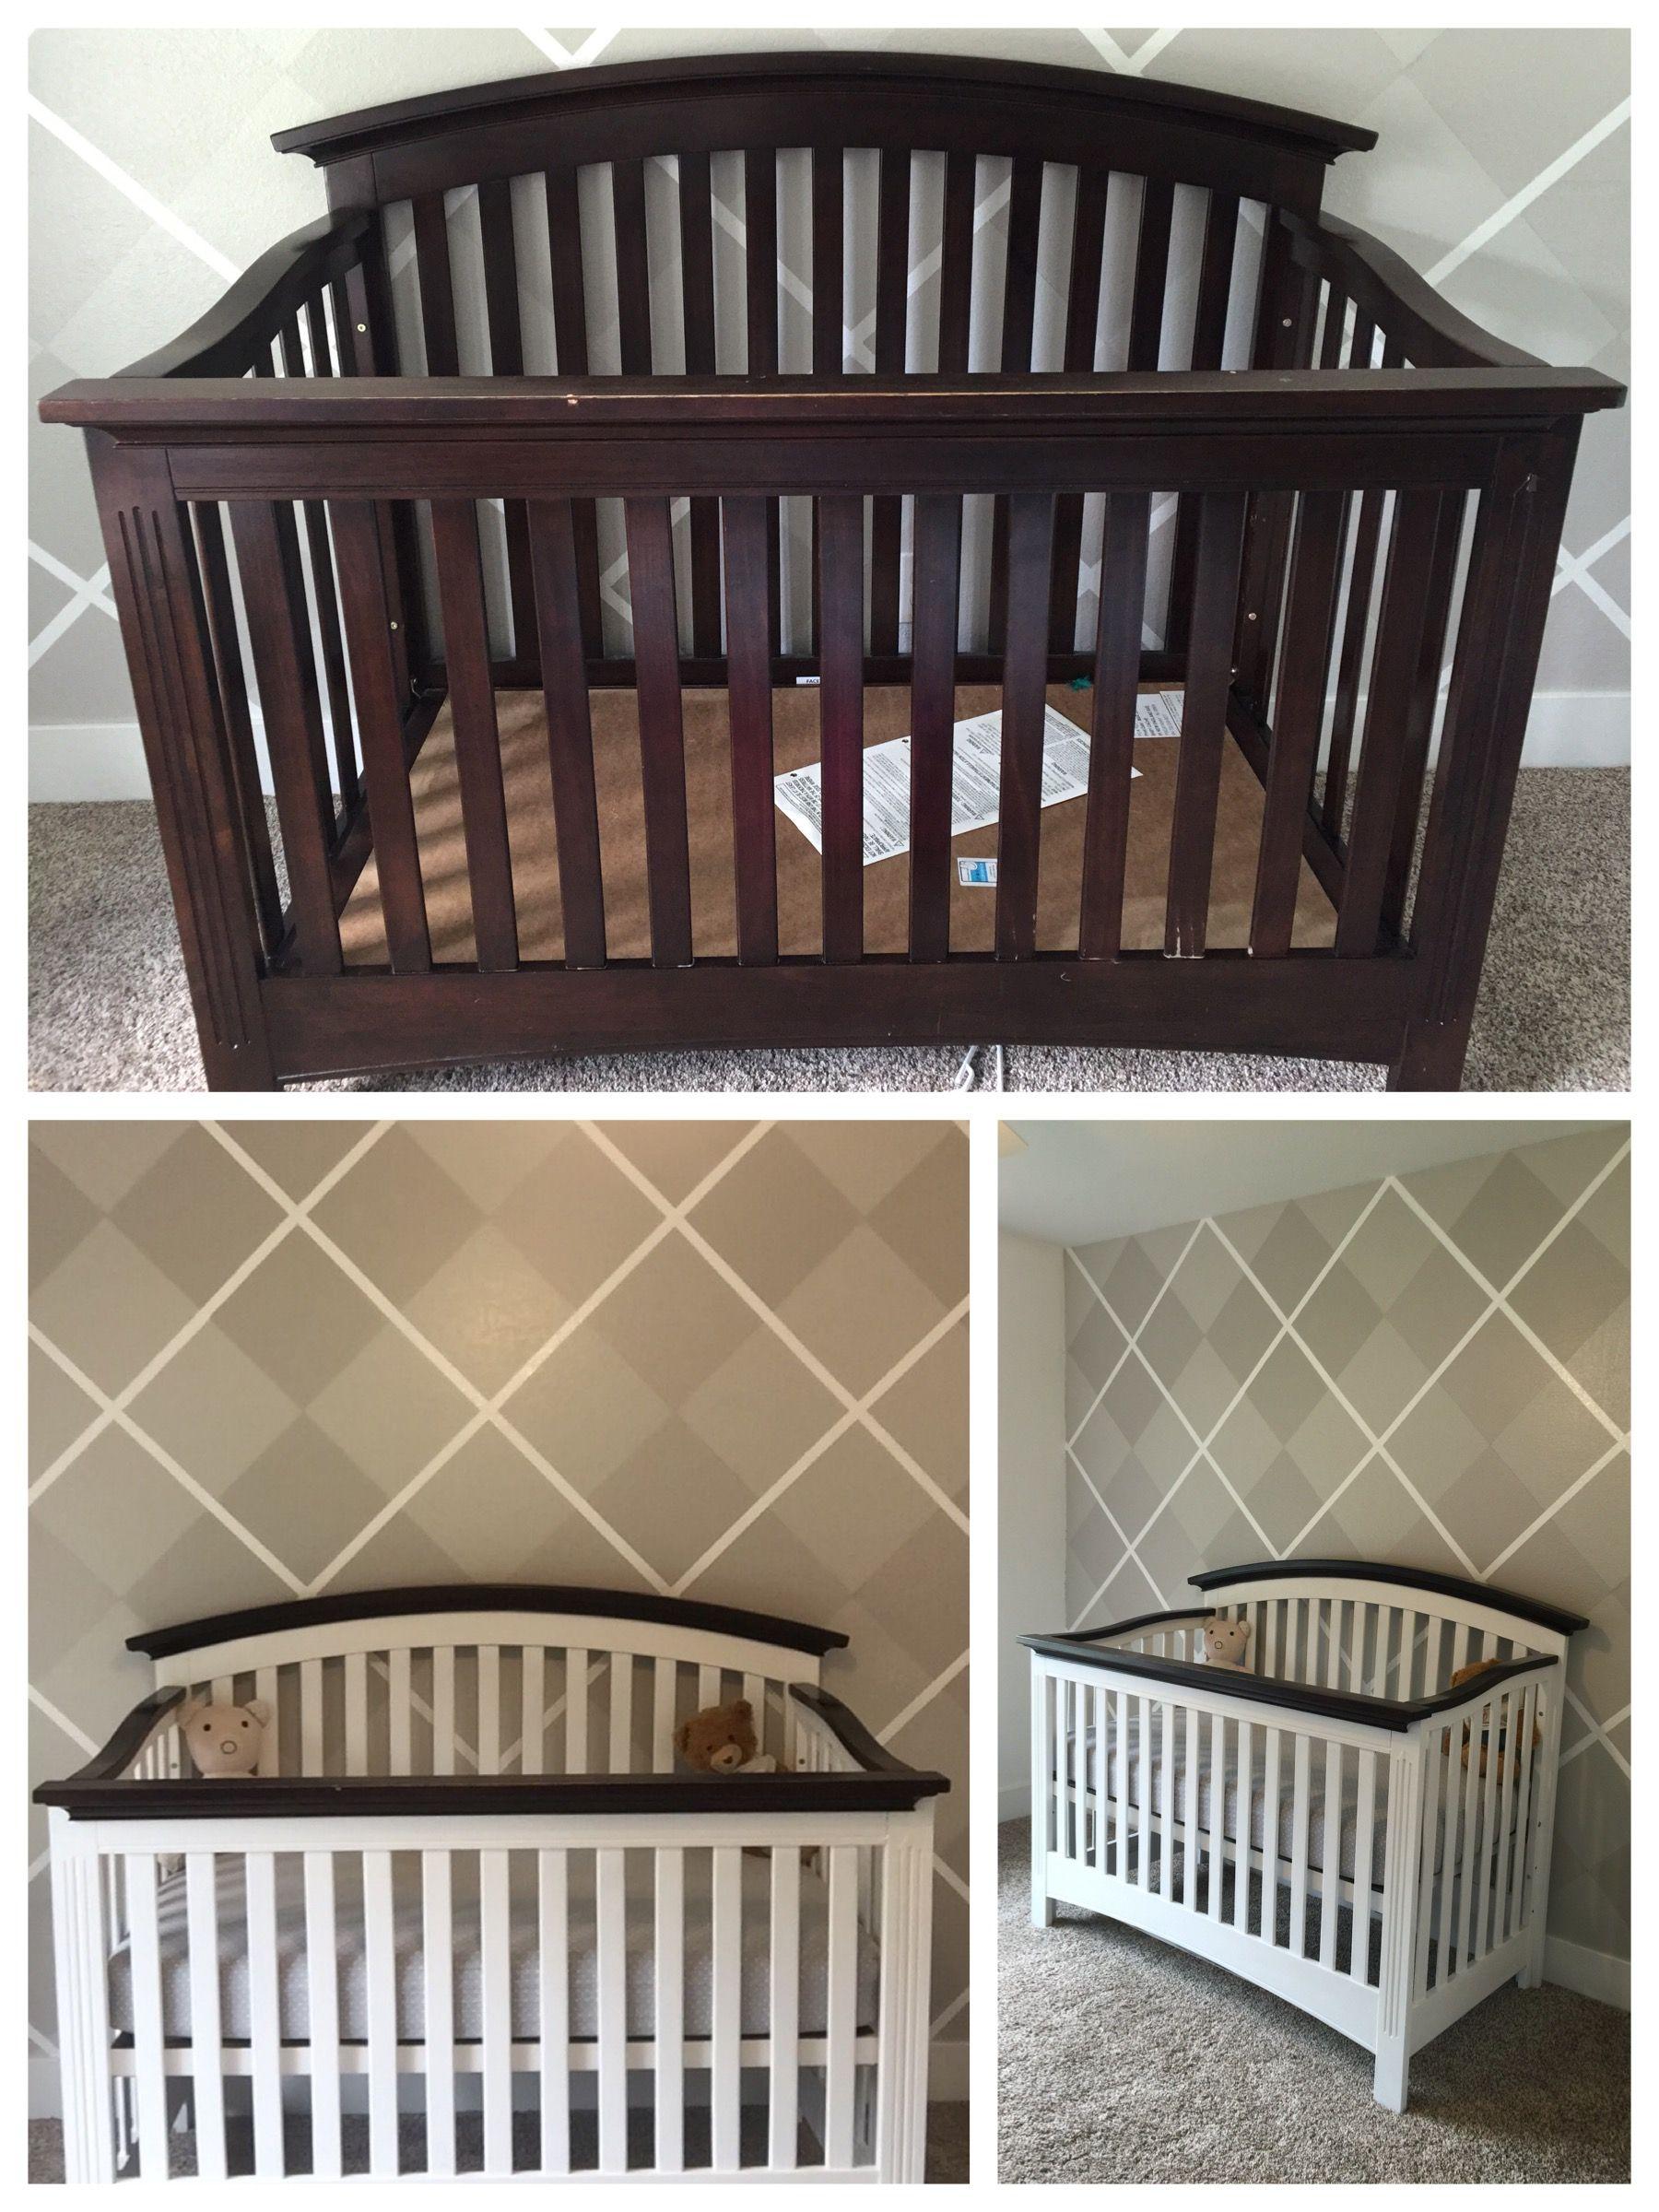 Chalk painted crib diy Painting a crib, Diy crib, Cribs